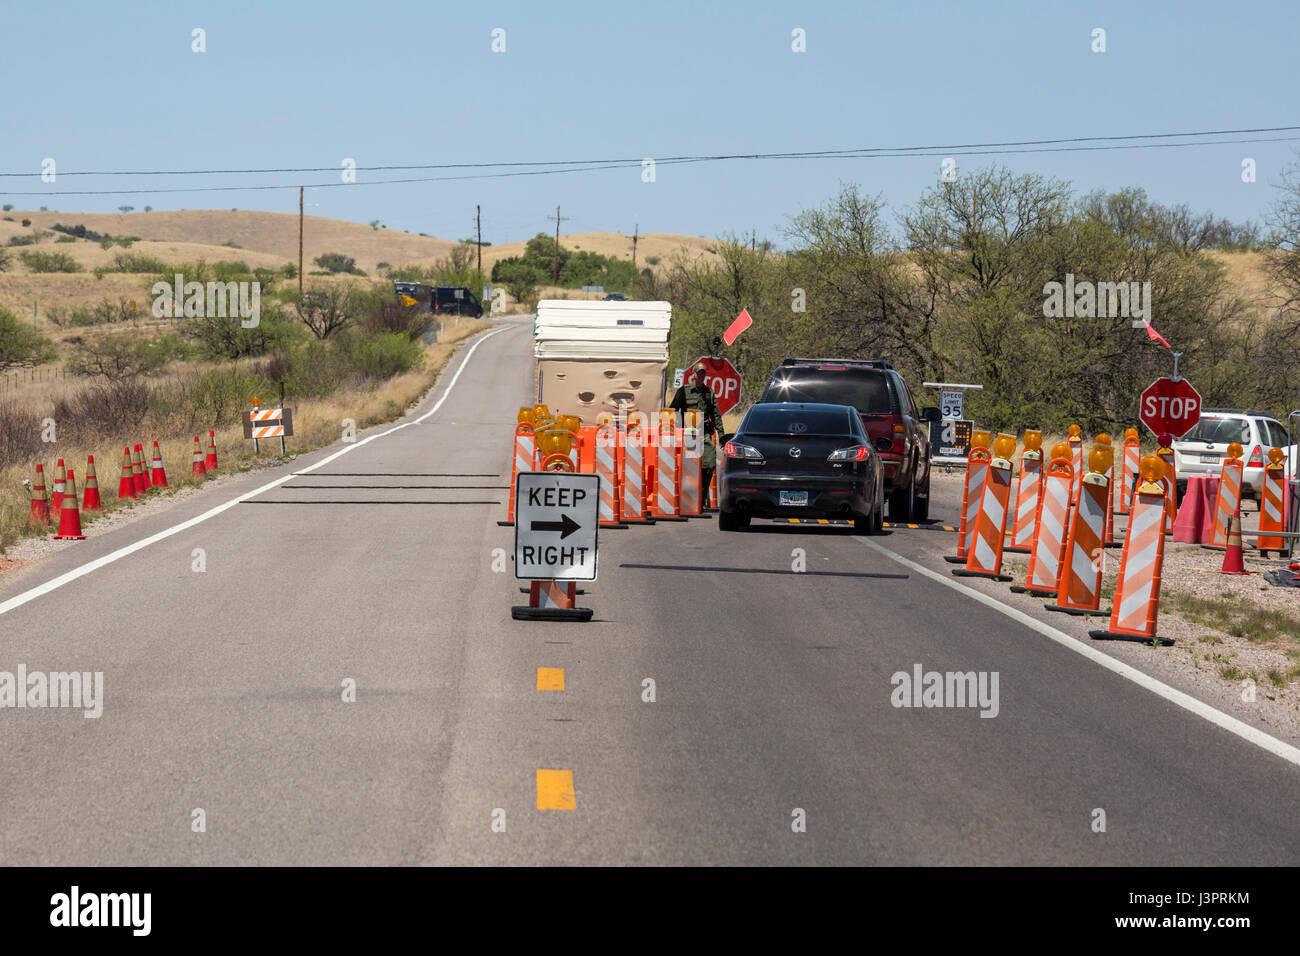 Sonoita Arizona A U S Border Patrol Checkpoint On Arizona Highway  Miles North Of The Mexican Border